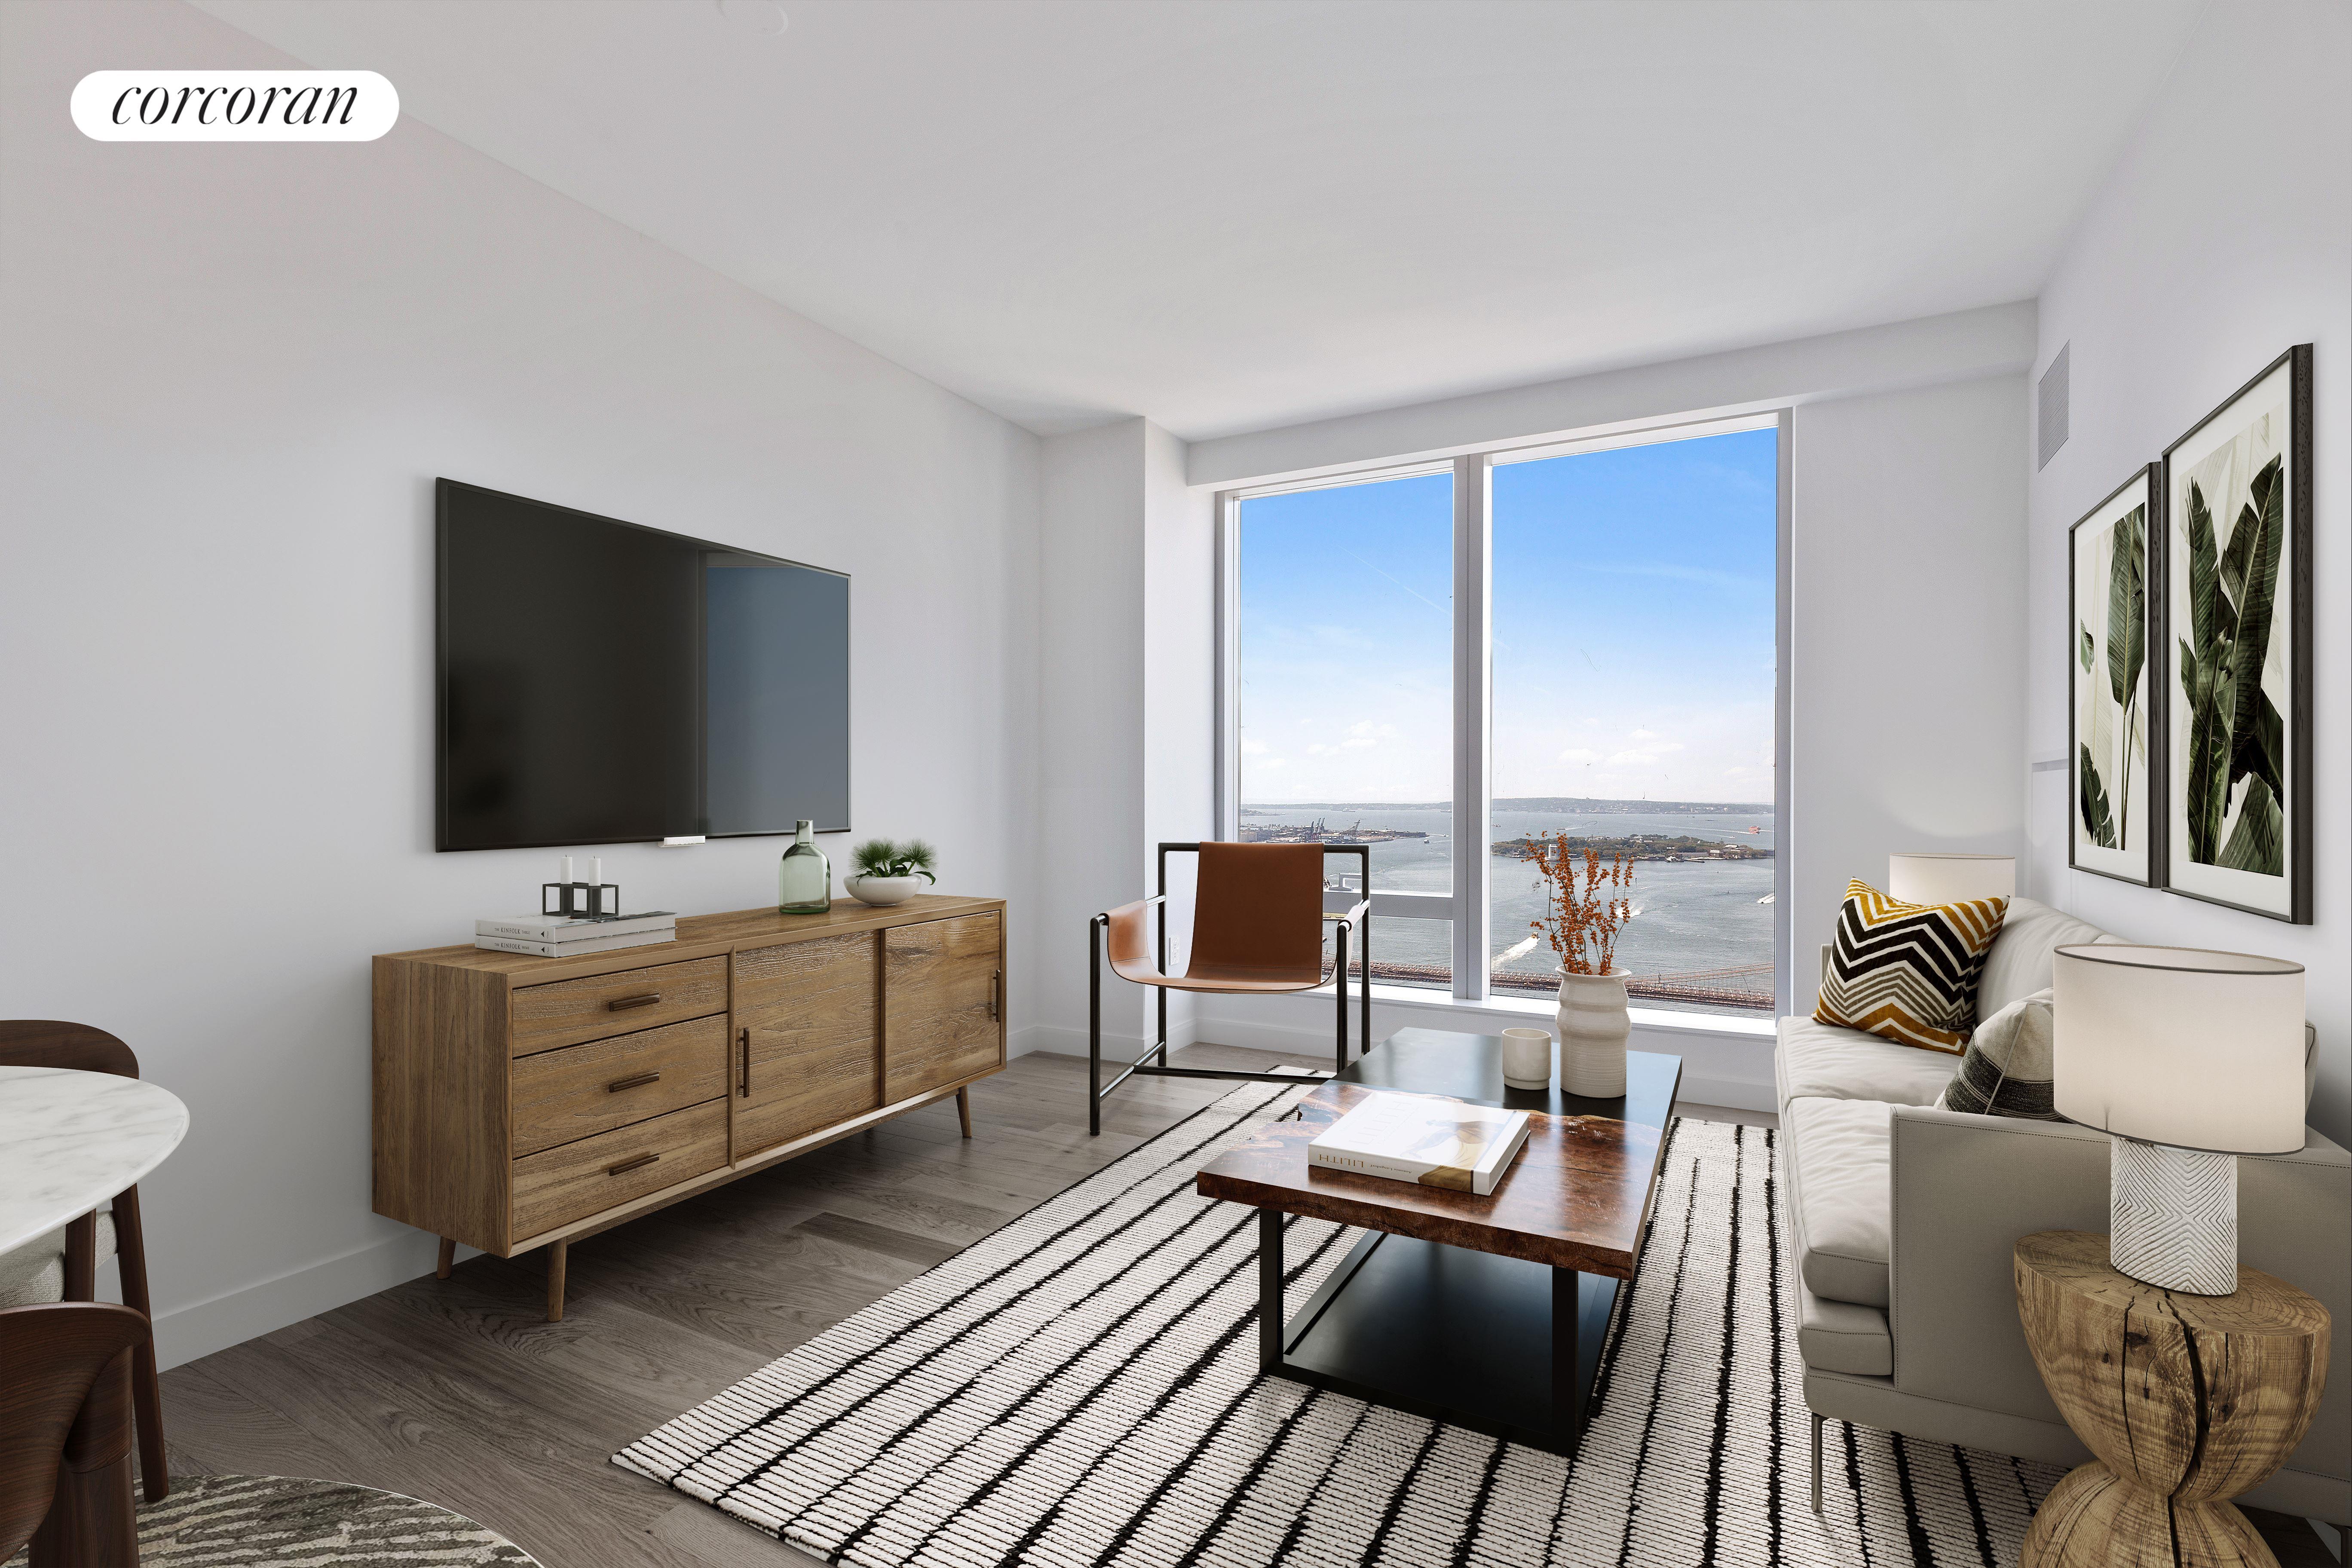 252 South Street, Apt 52M, Manhattan, New York 10002